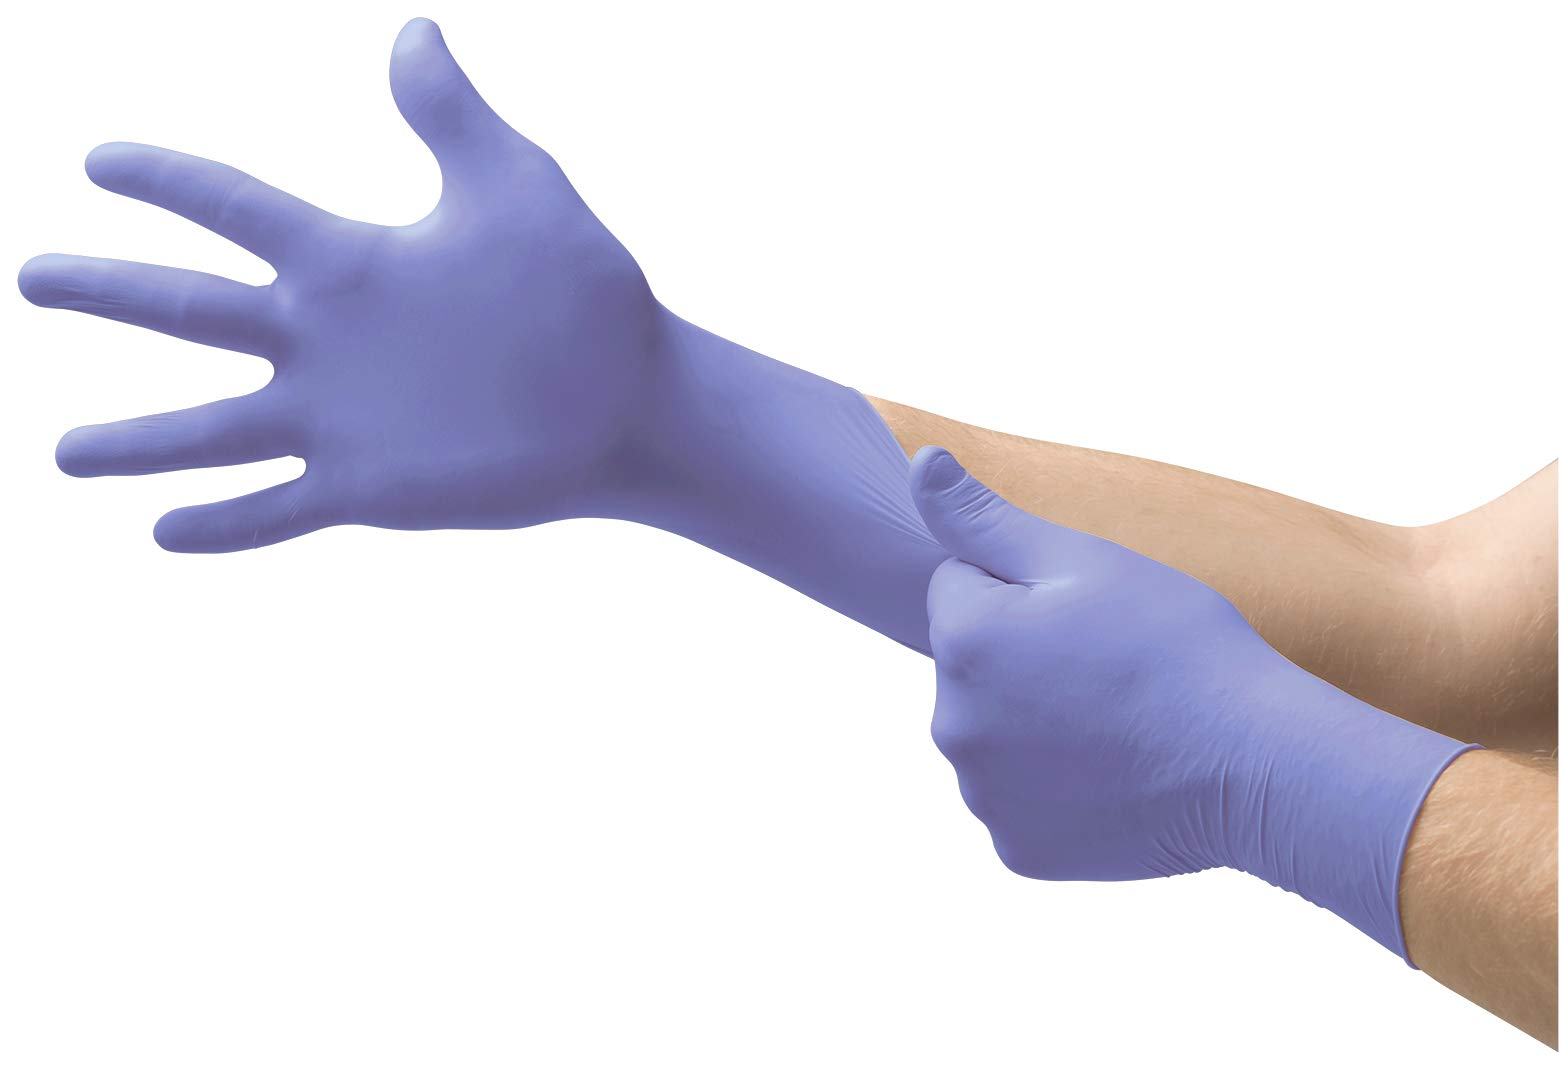 Microflex Supreno SE SU-690 Nitrile Gloves -  Disposable, Blue / Violet Size Medium (Case of 1,000)